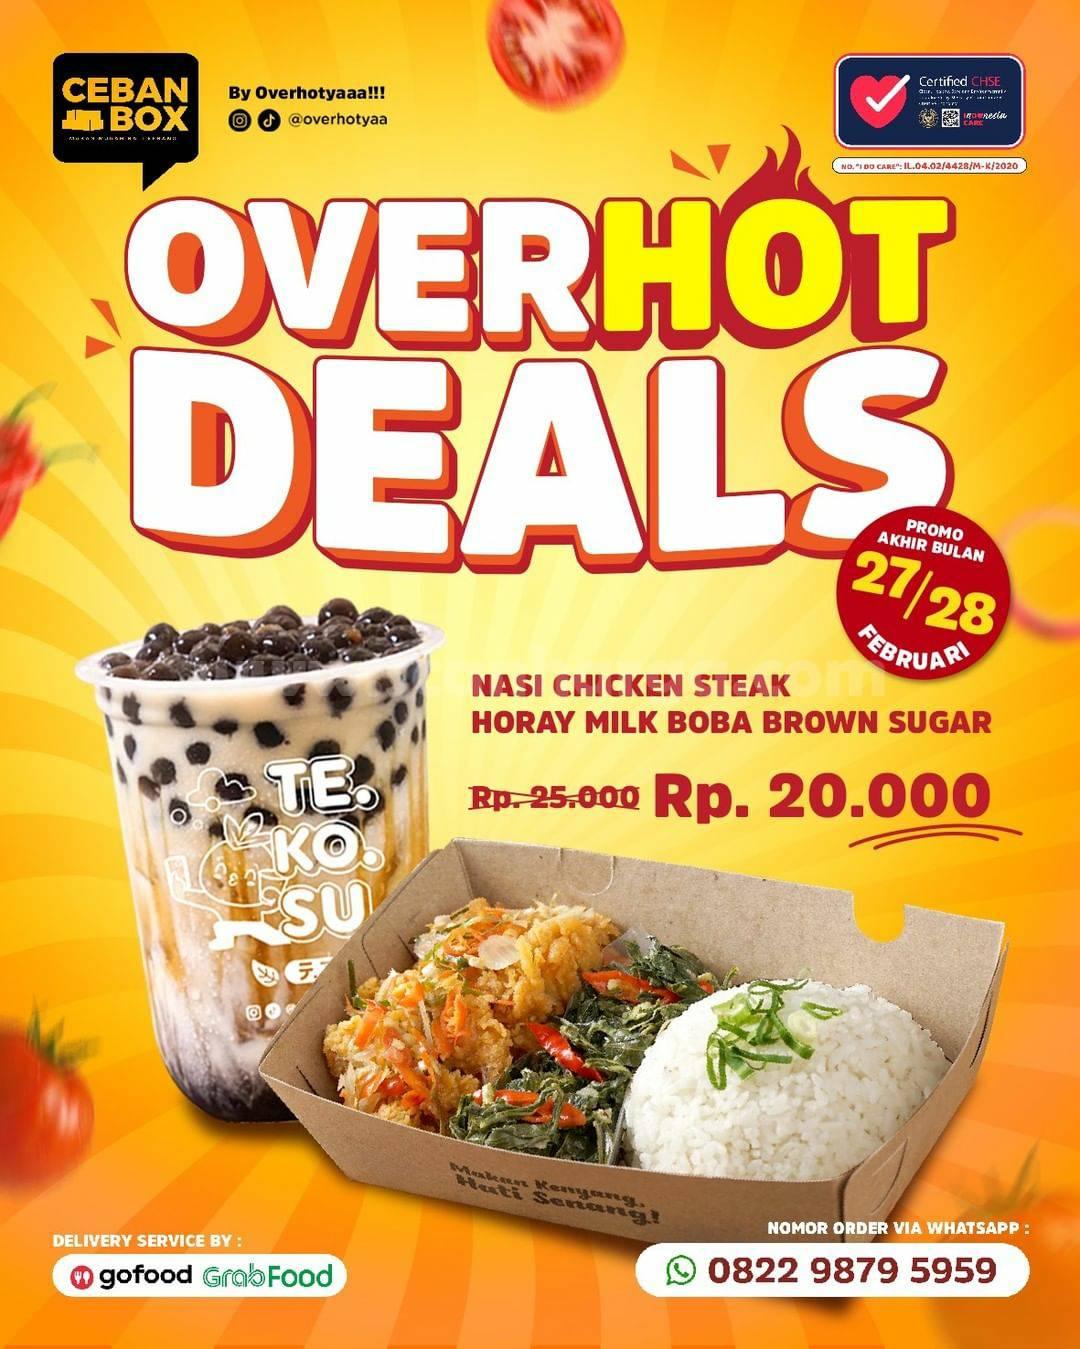 OVER HOT YAA Promo Paket OVERHOT DEAL! Harga cuma Rp 20.000